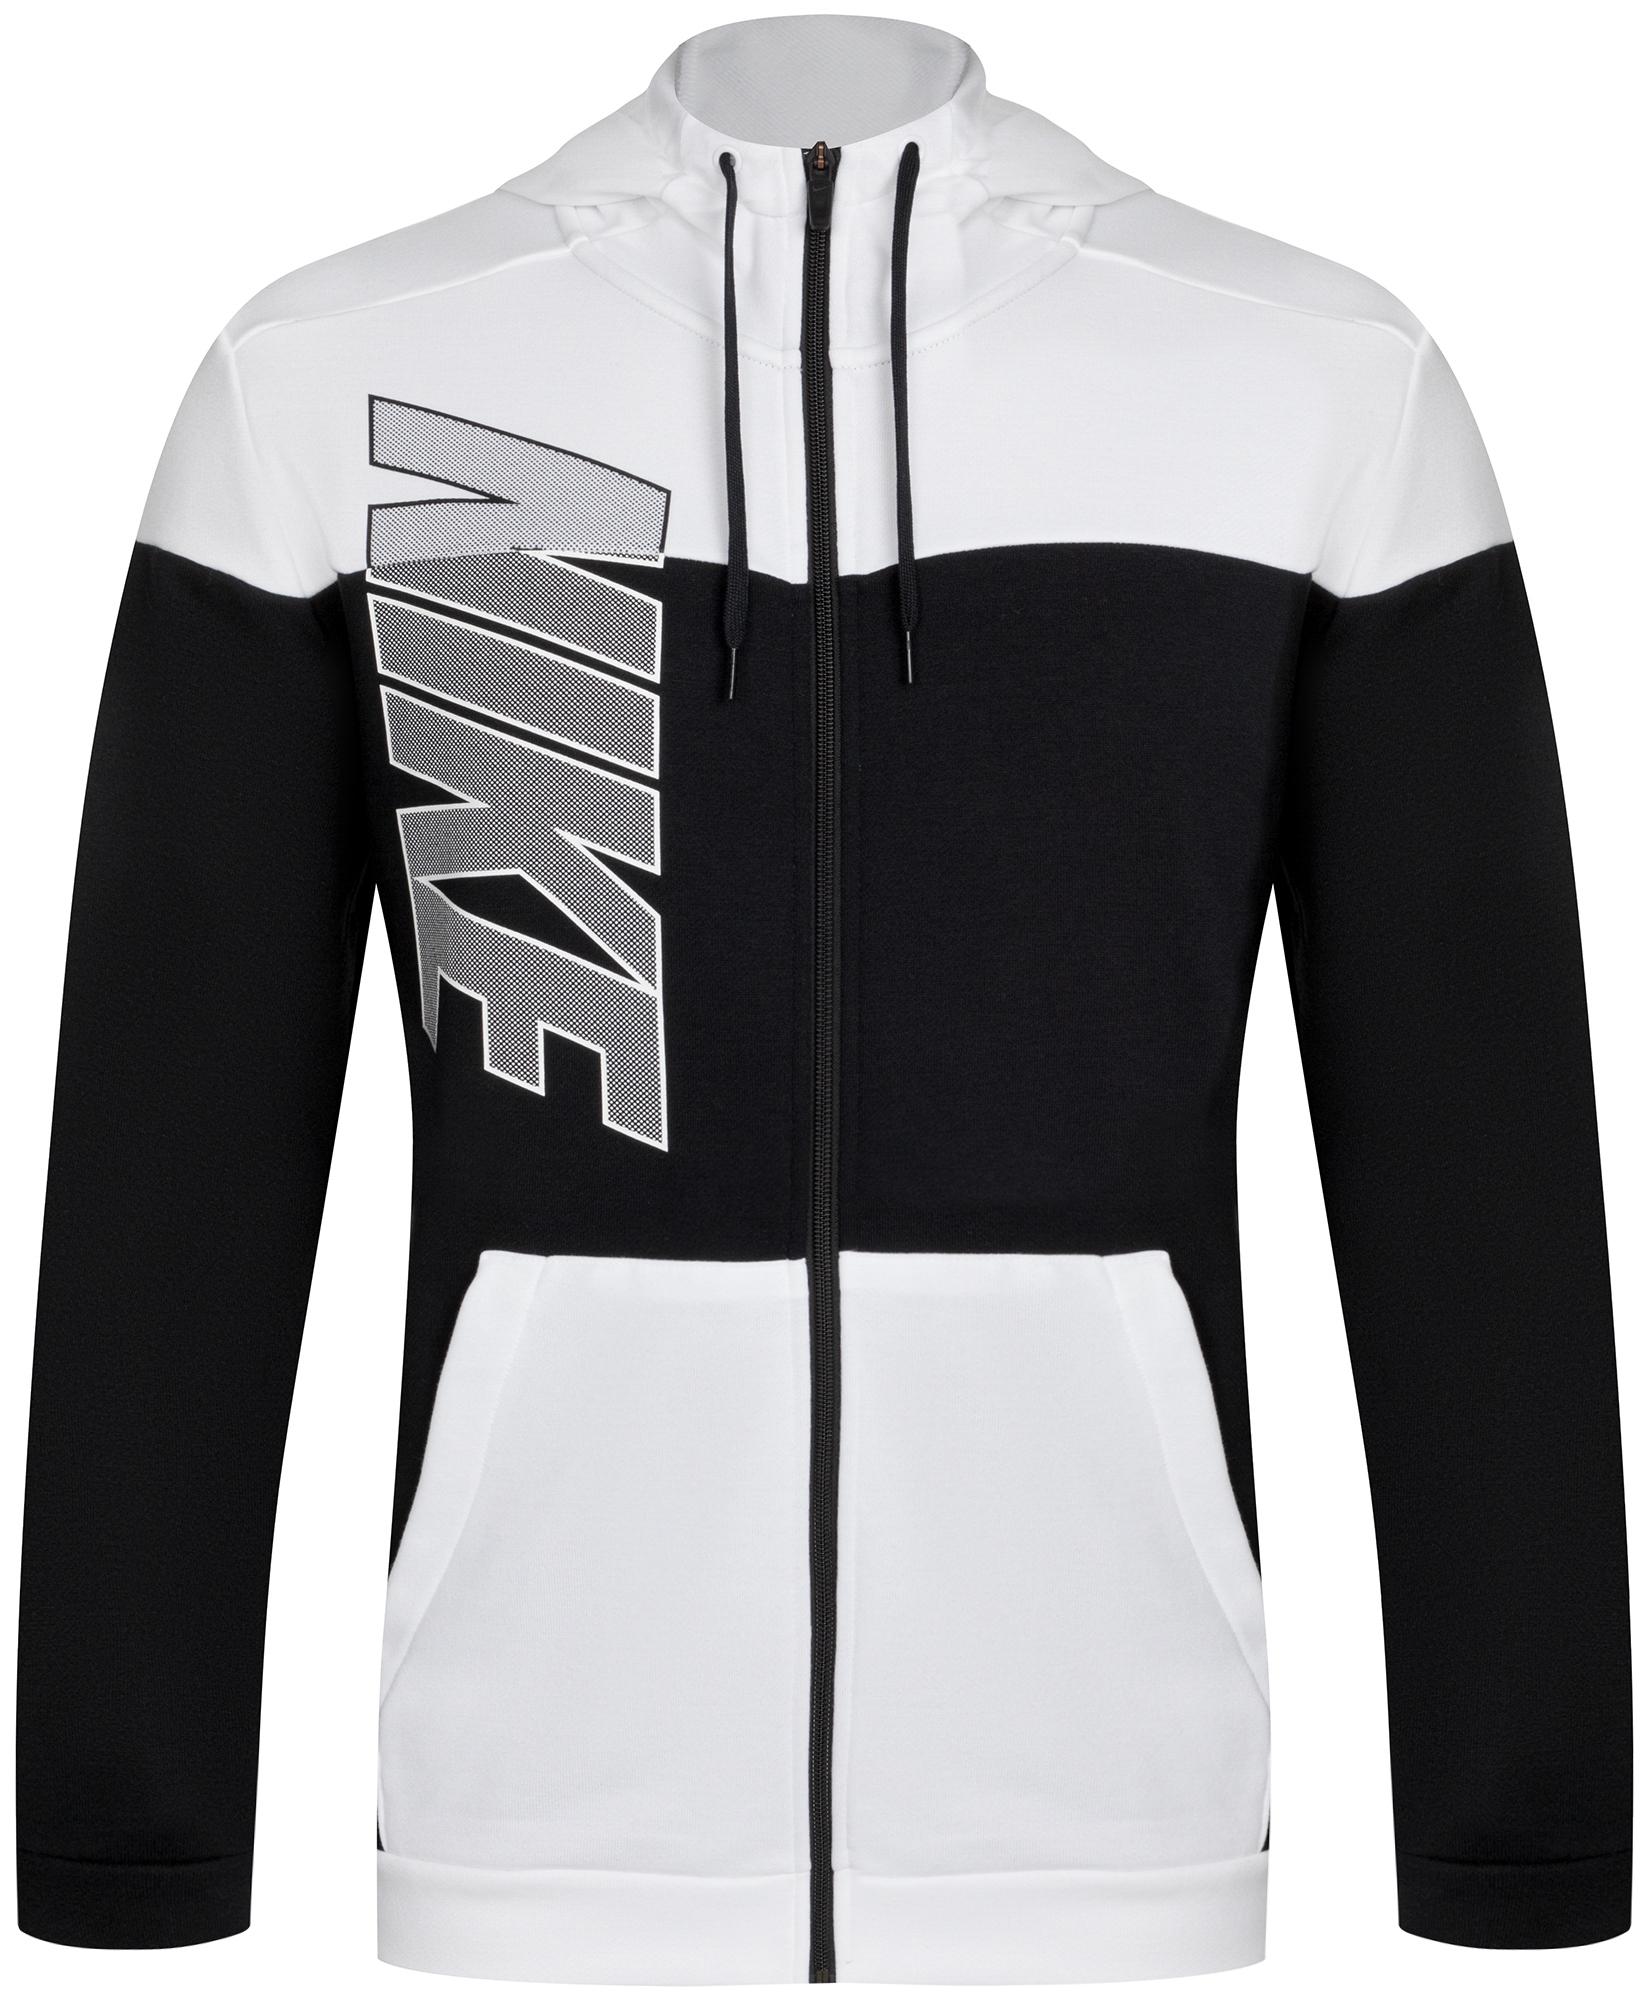 Nike Толстовка мужская Nike Dri-FIT, размер 44-46 мужская толстовка 2015 slim fit w20